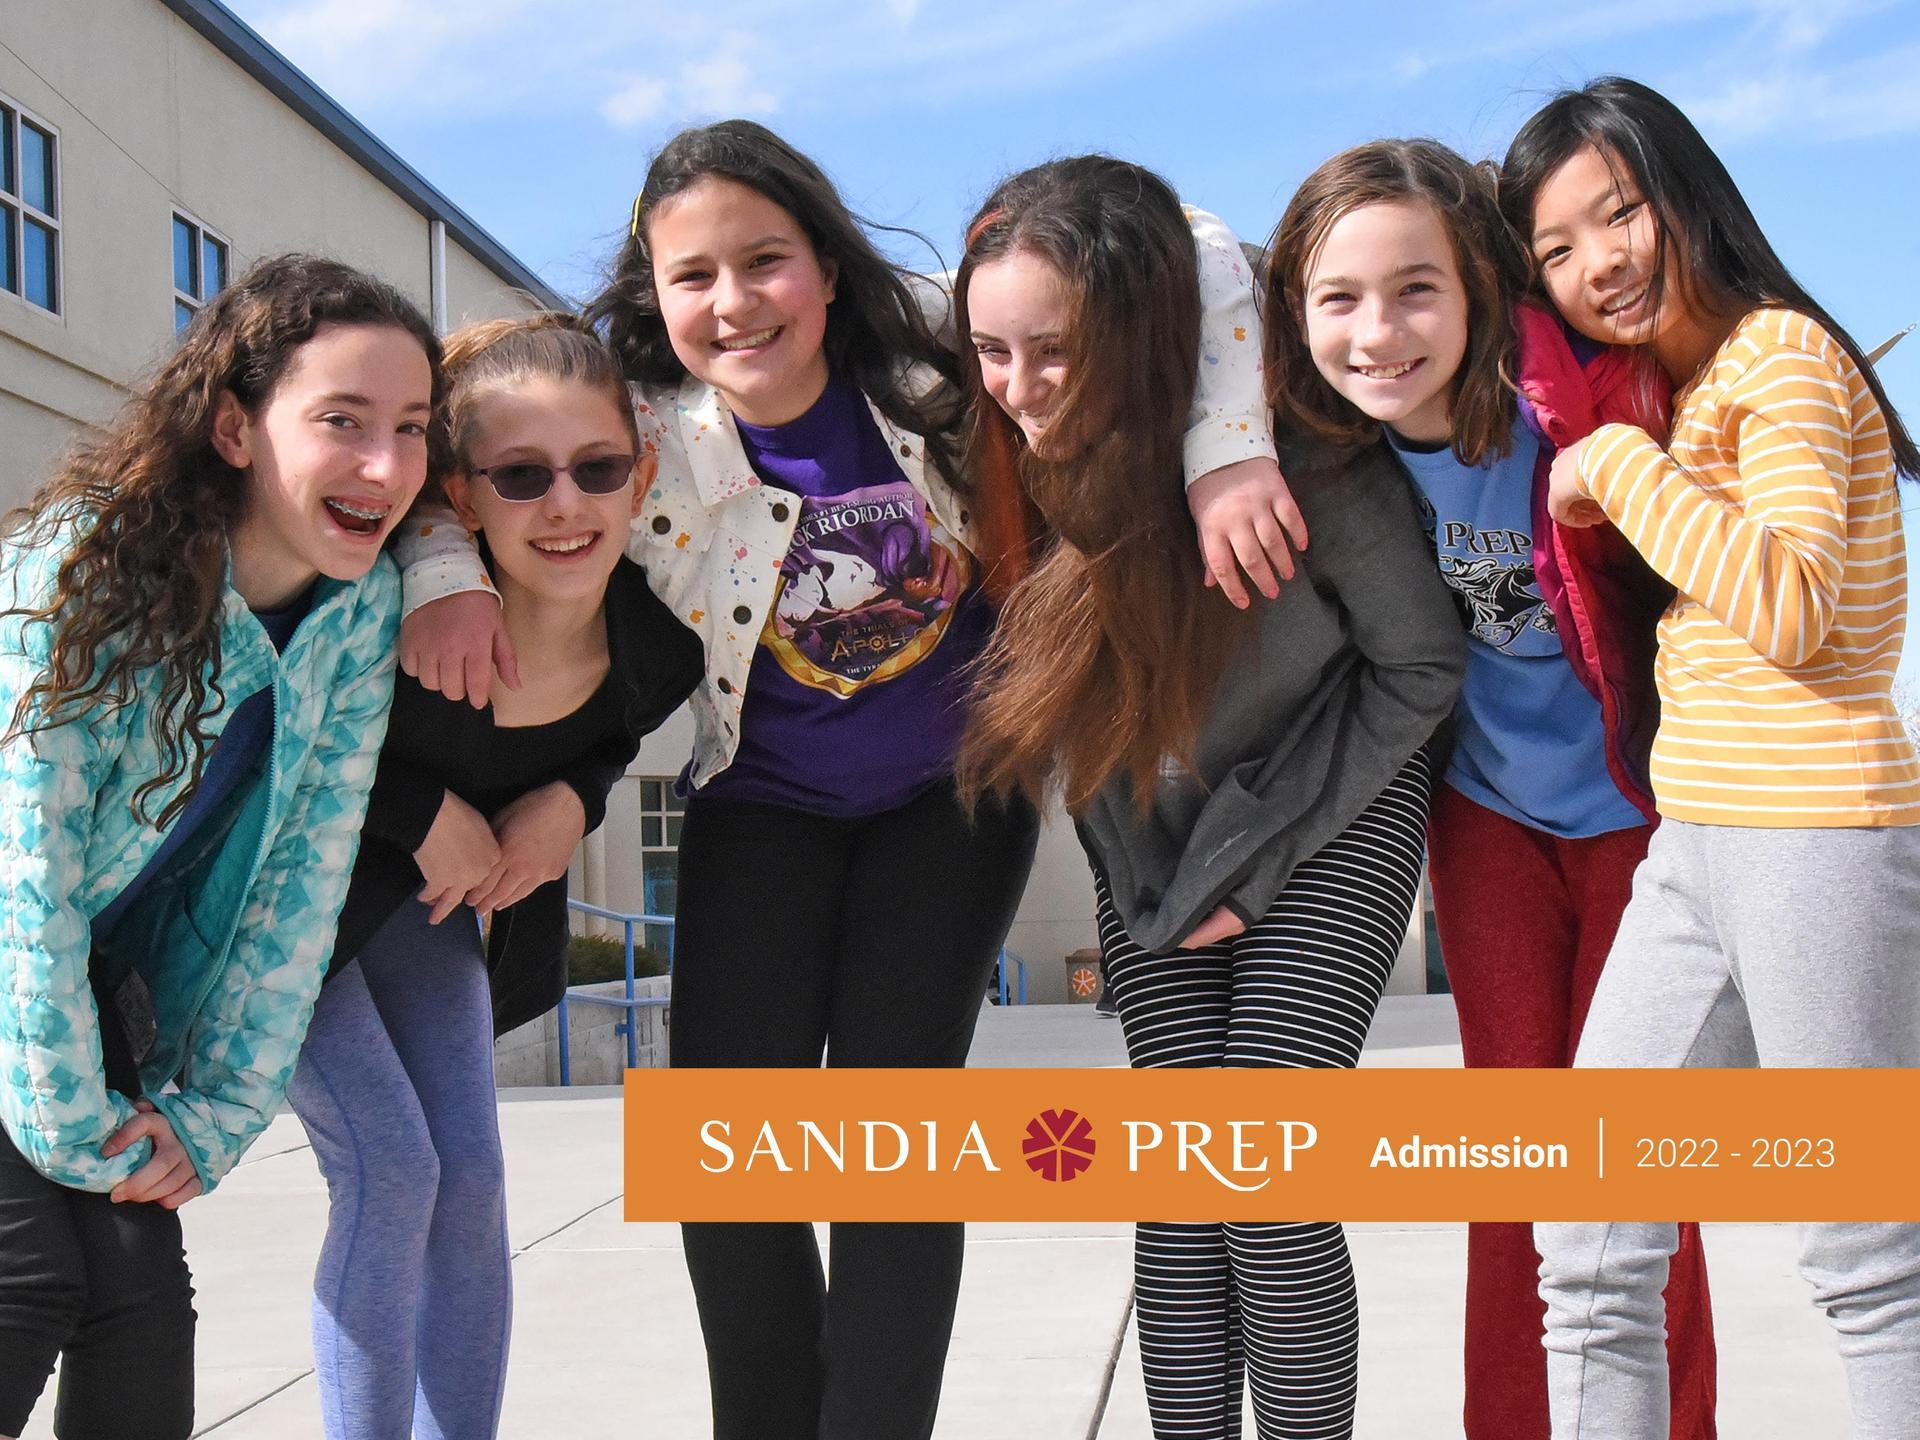 Apply to Sandia Prep today - Explore our digital viewbook